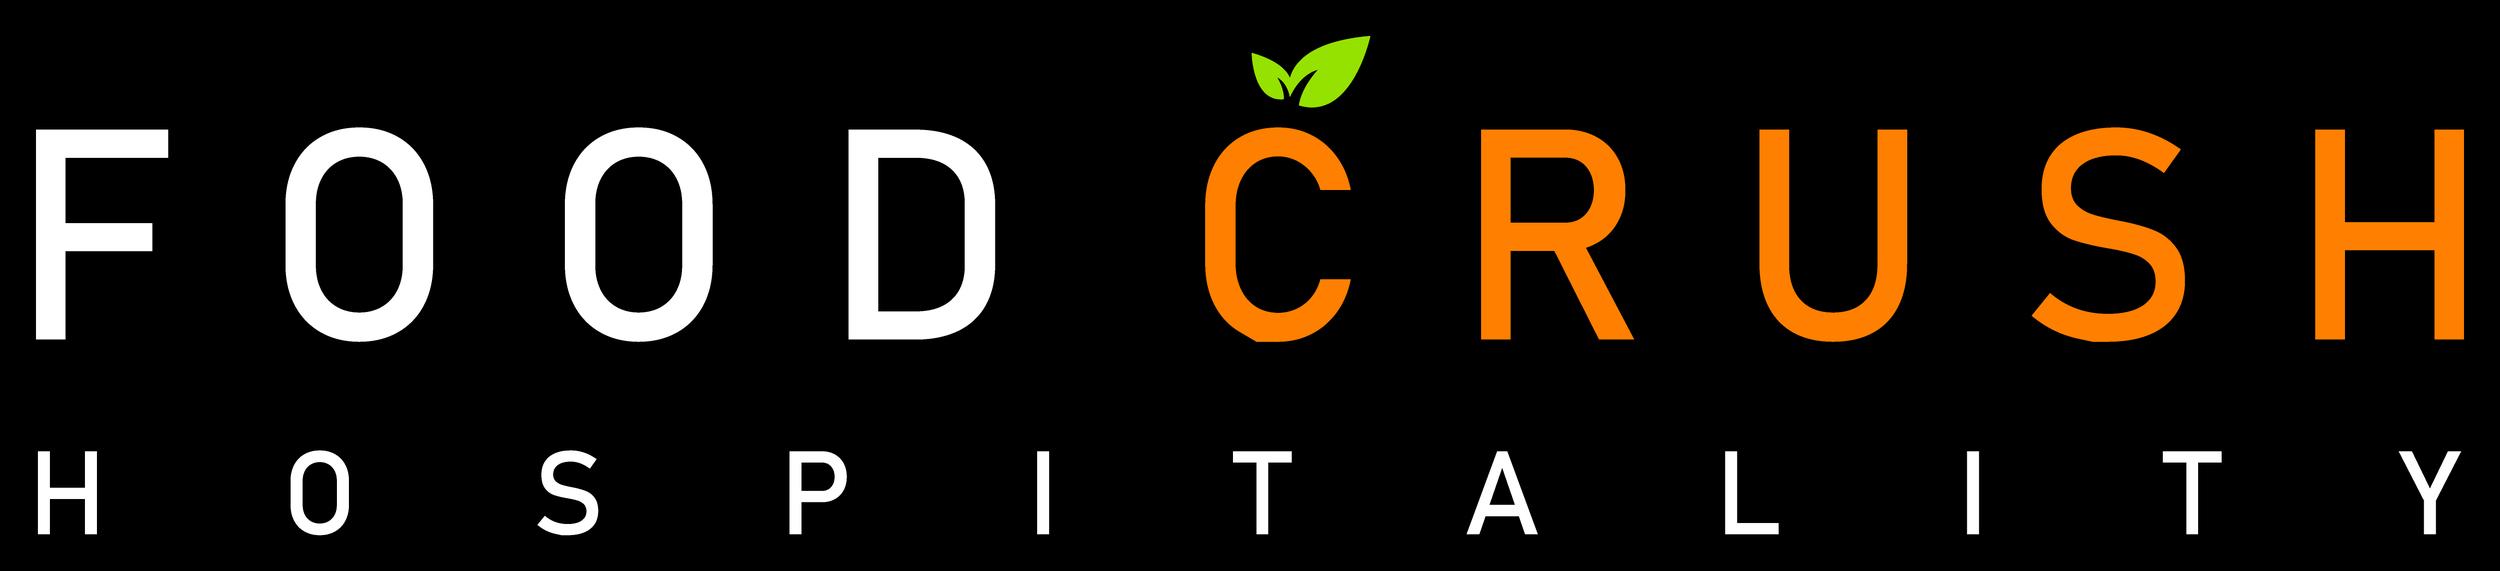 FoodCrush Logo2.png